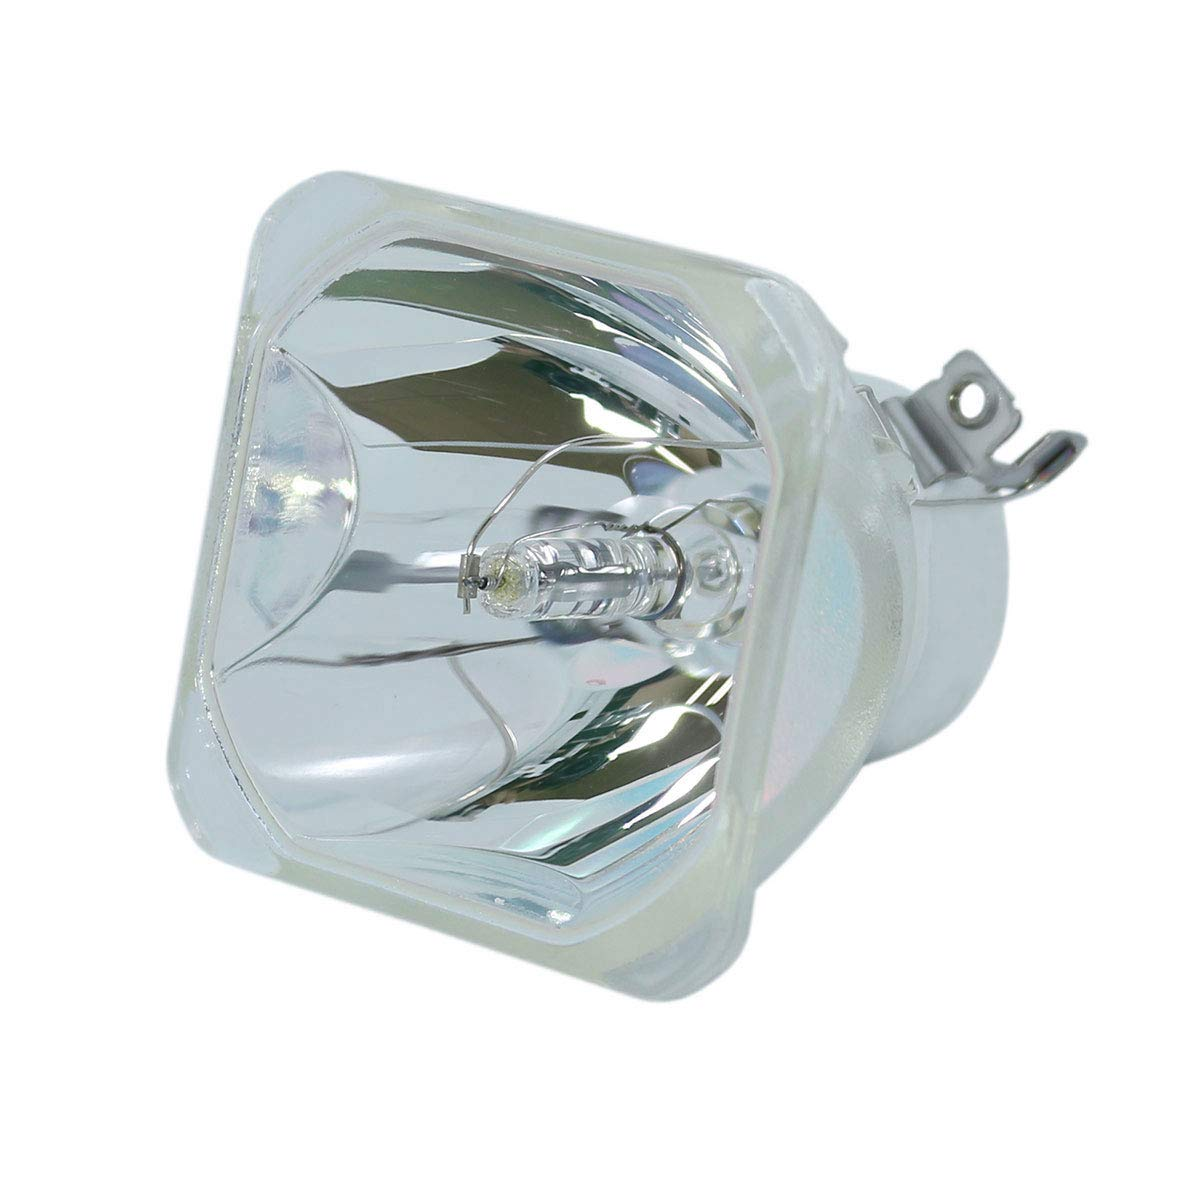 SpArc 交換用プロジェクターランプ 囲い/電球付き NEC NP-UM361X用 Economy B07MBW3WVM Lamp Only Economy